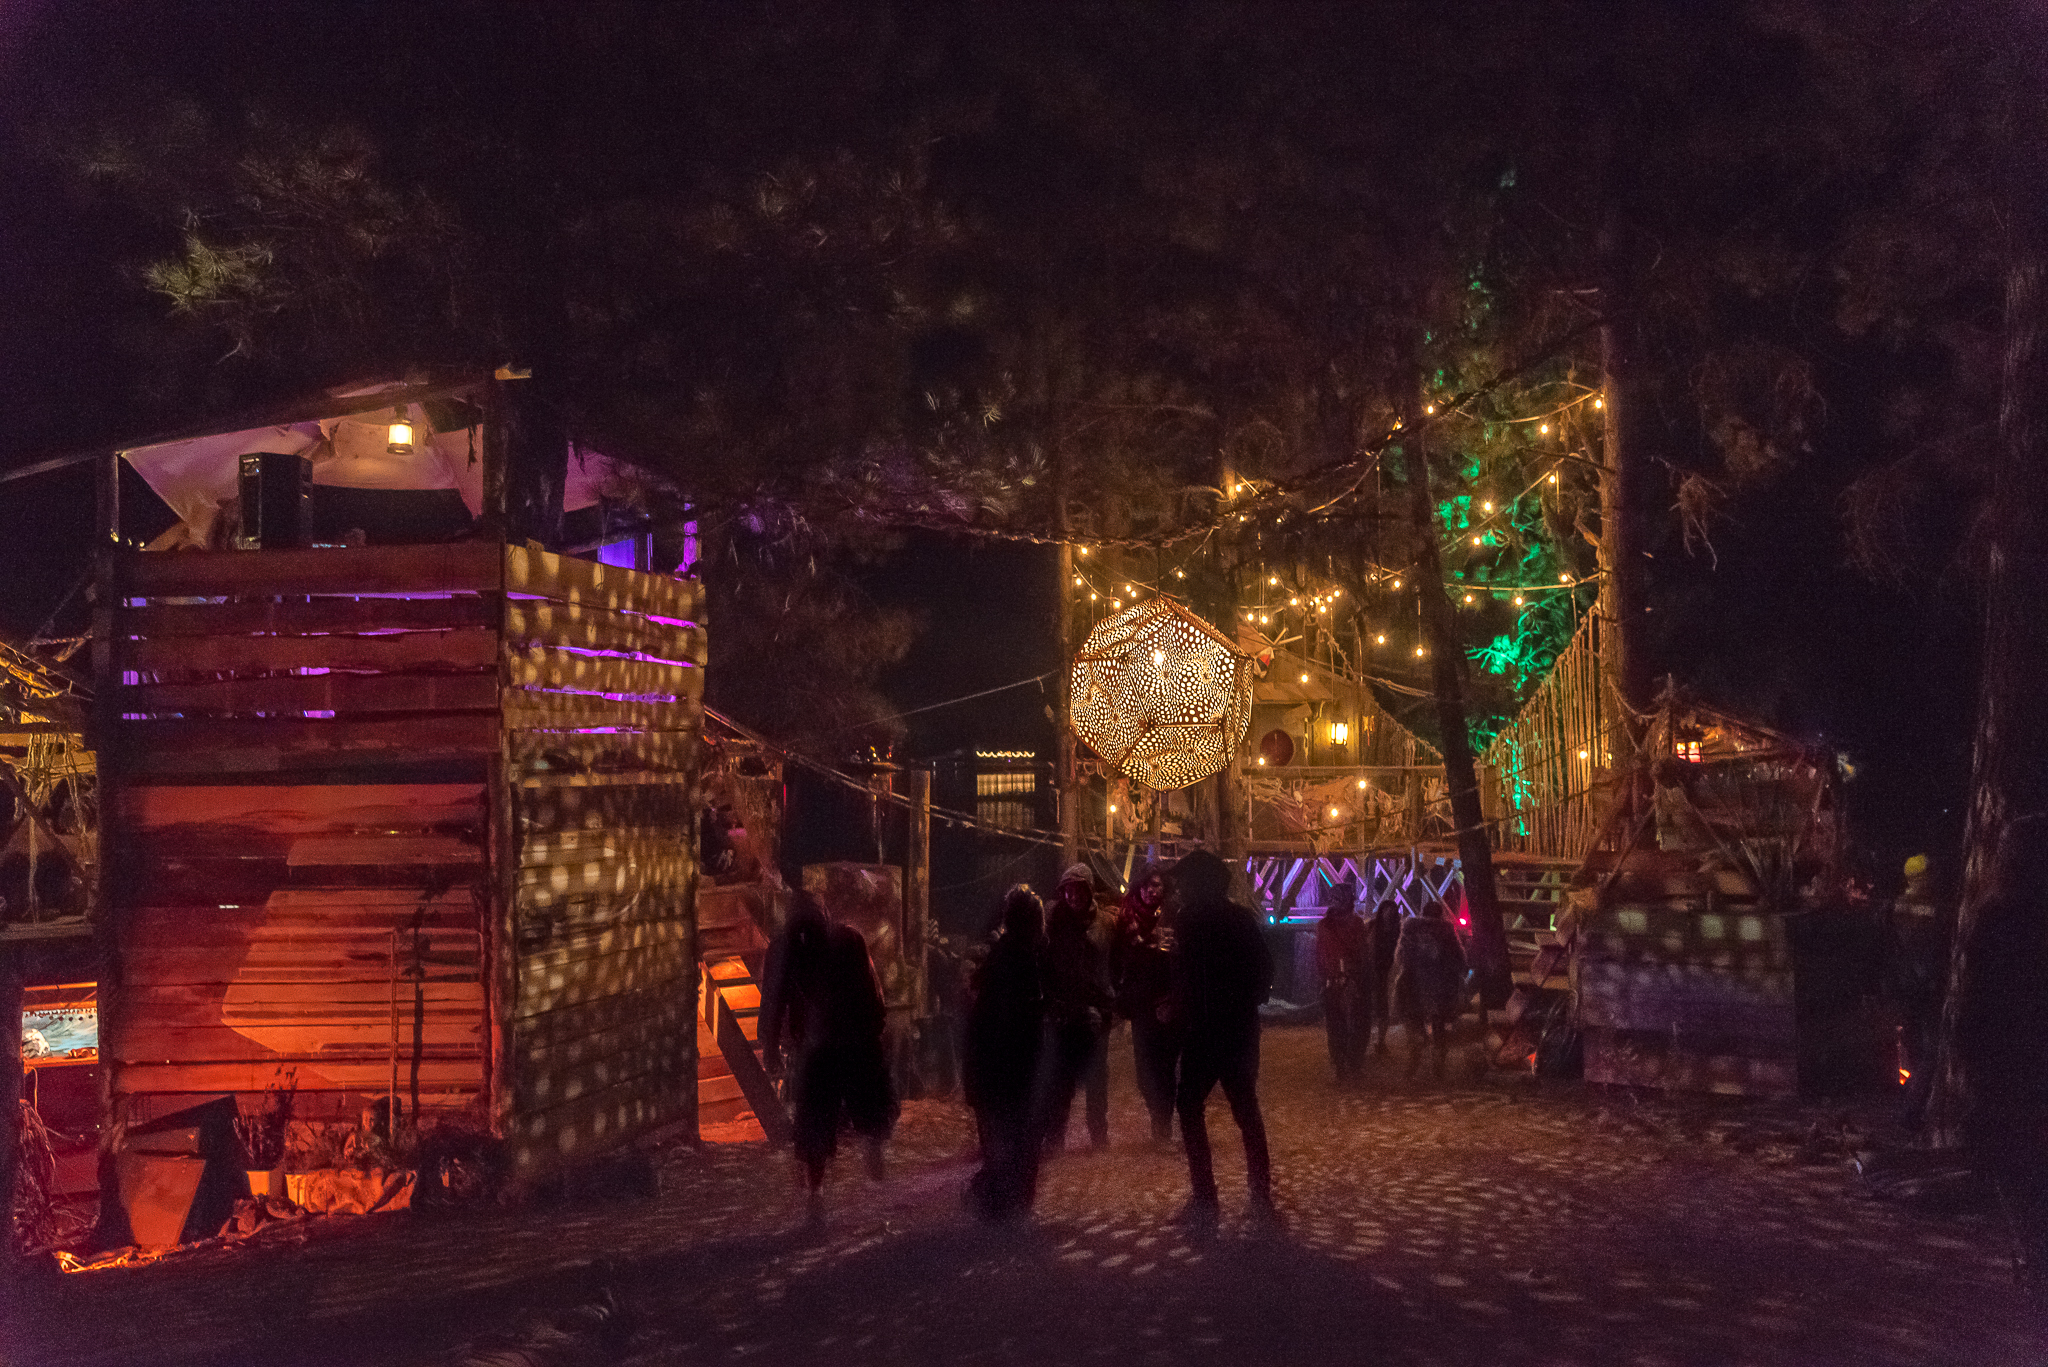 Treehouses and fairy-tales awaited.